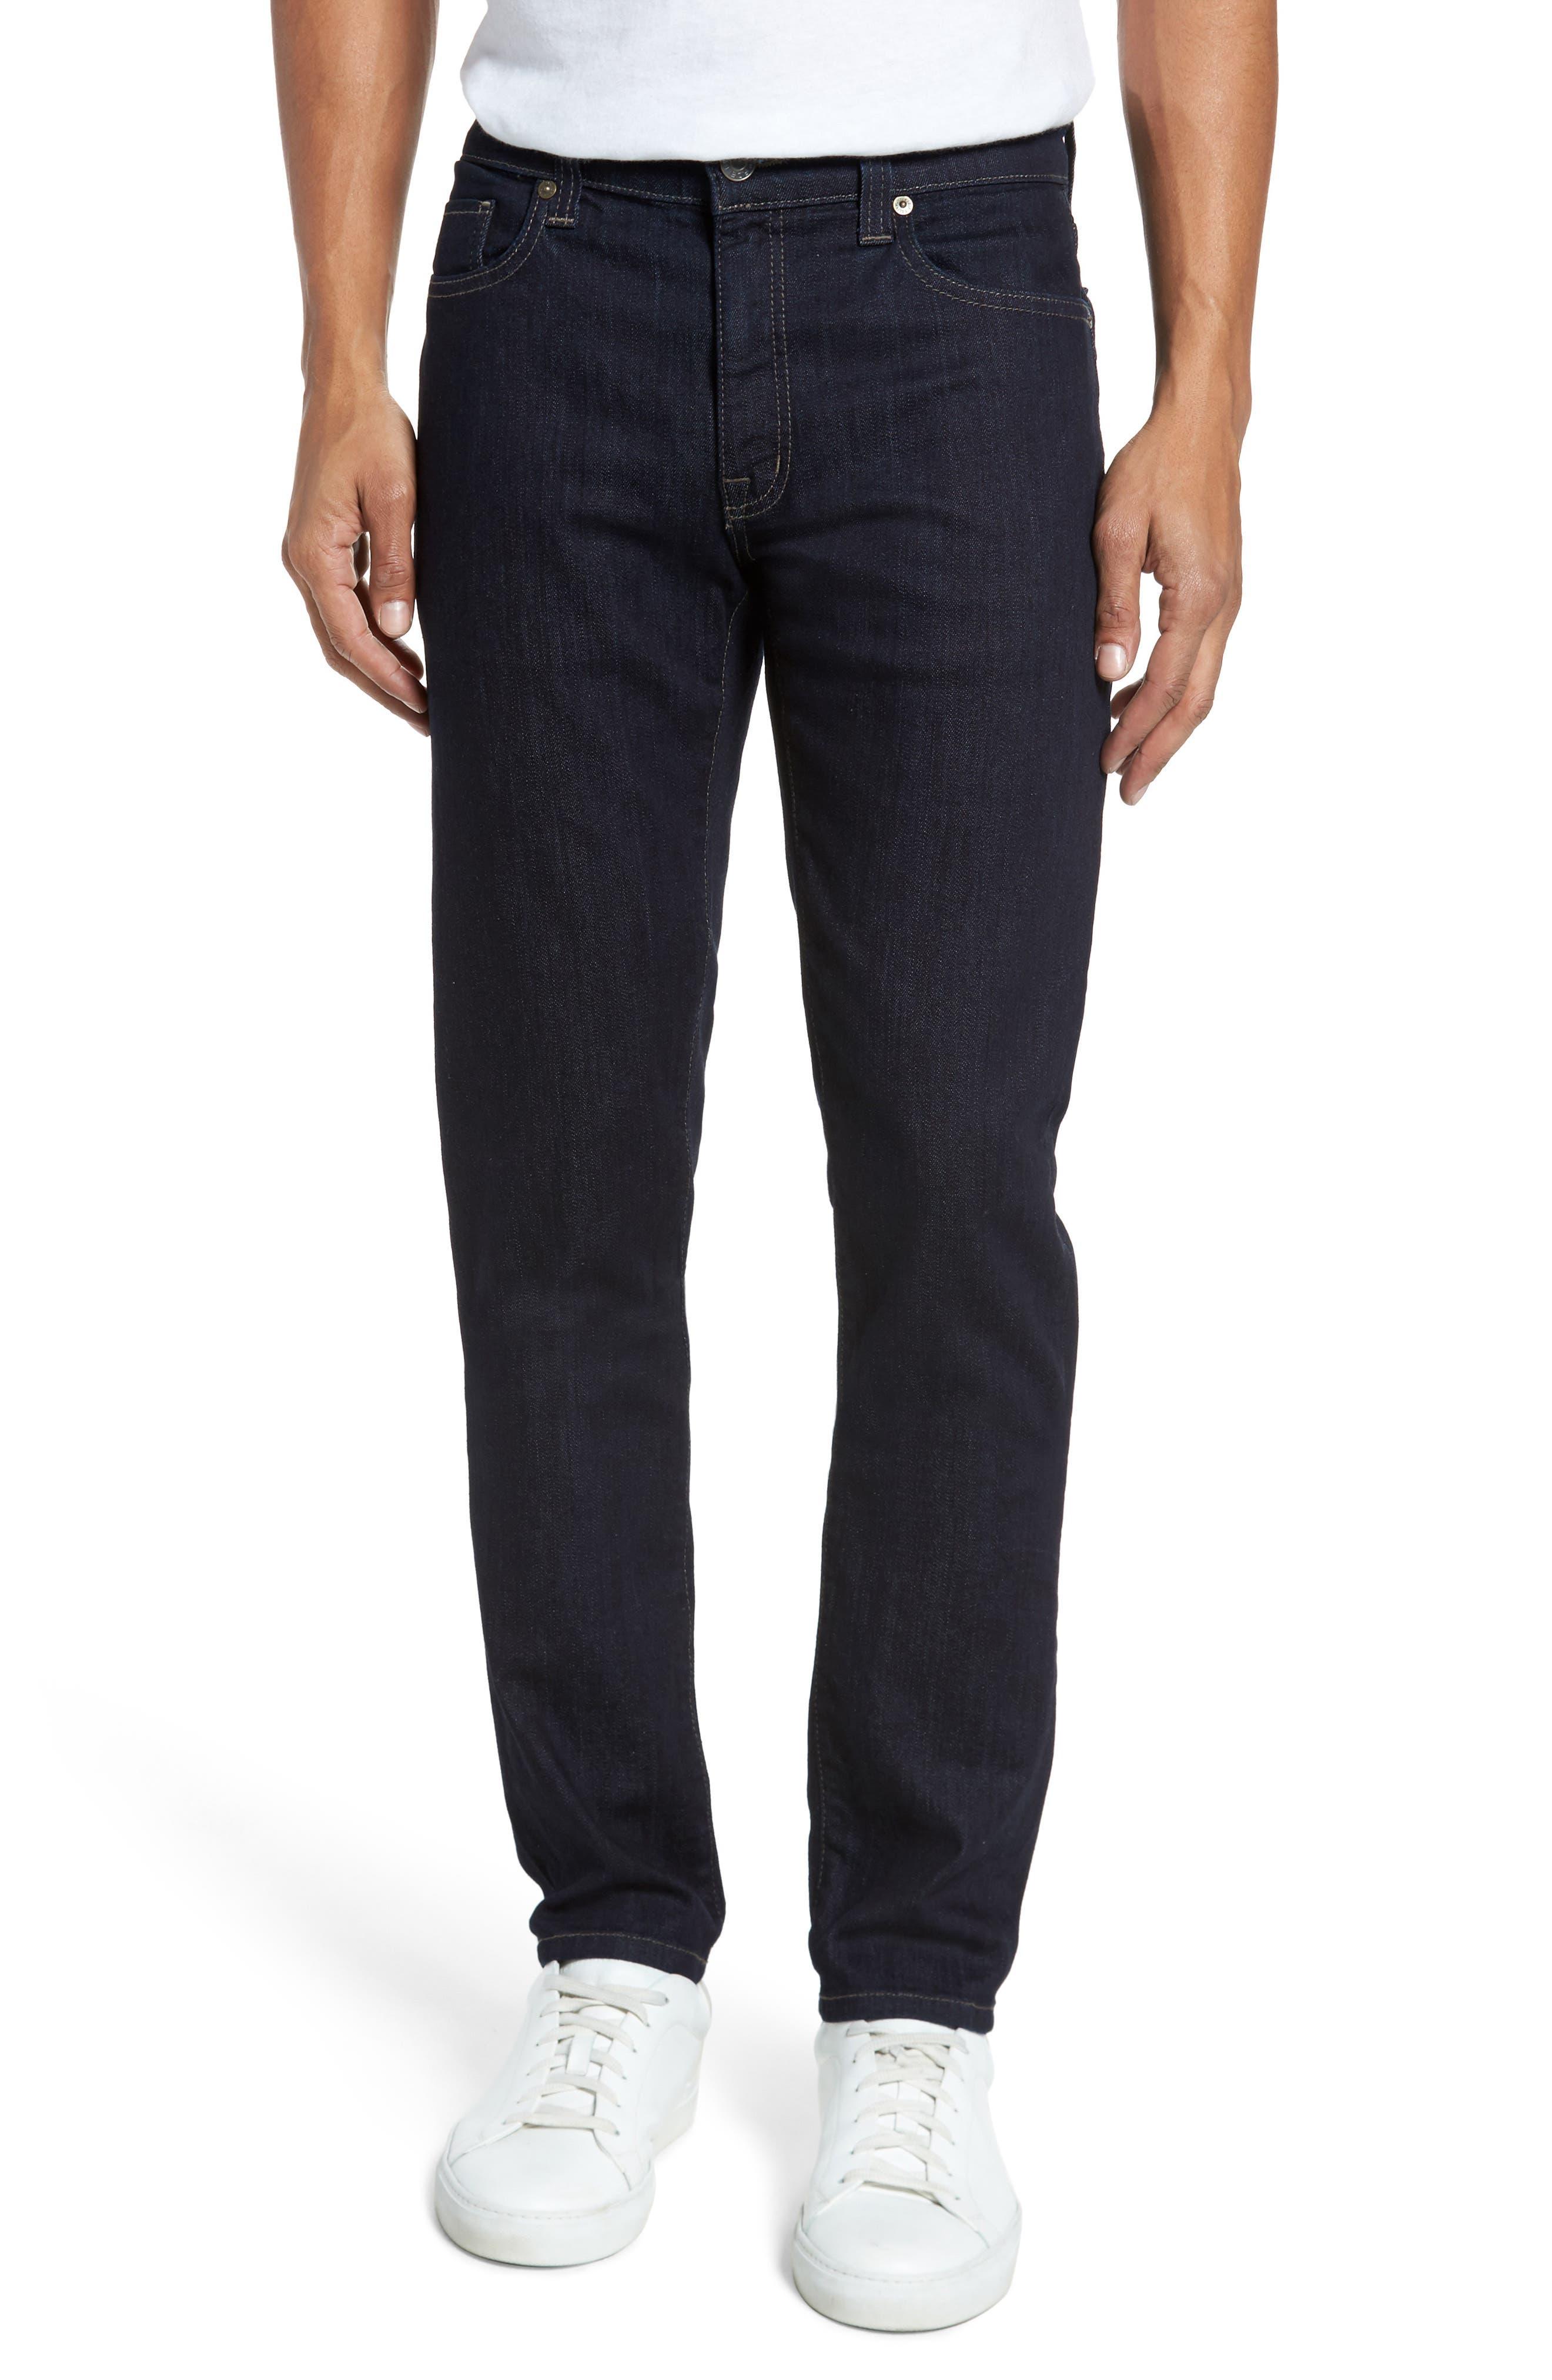 Main Image - Fidelity Denim Slim Fit Jeans (Galaxy)